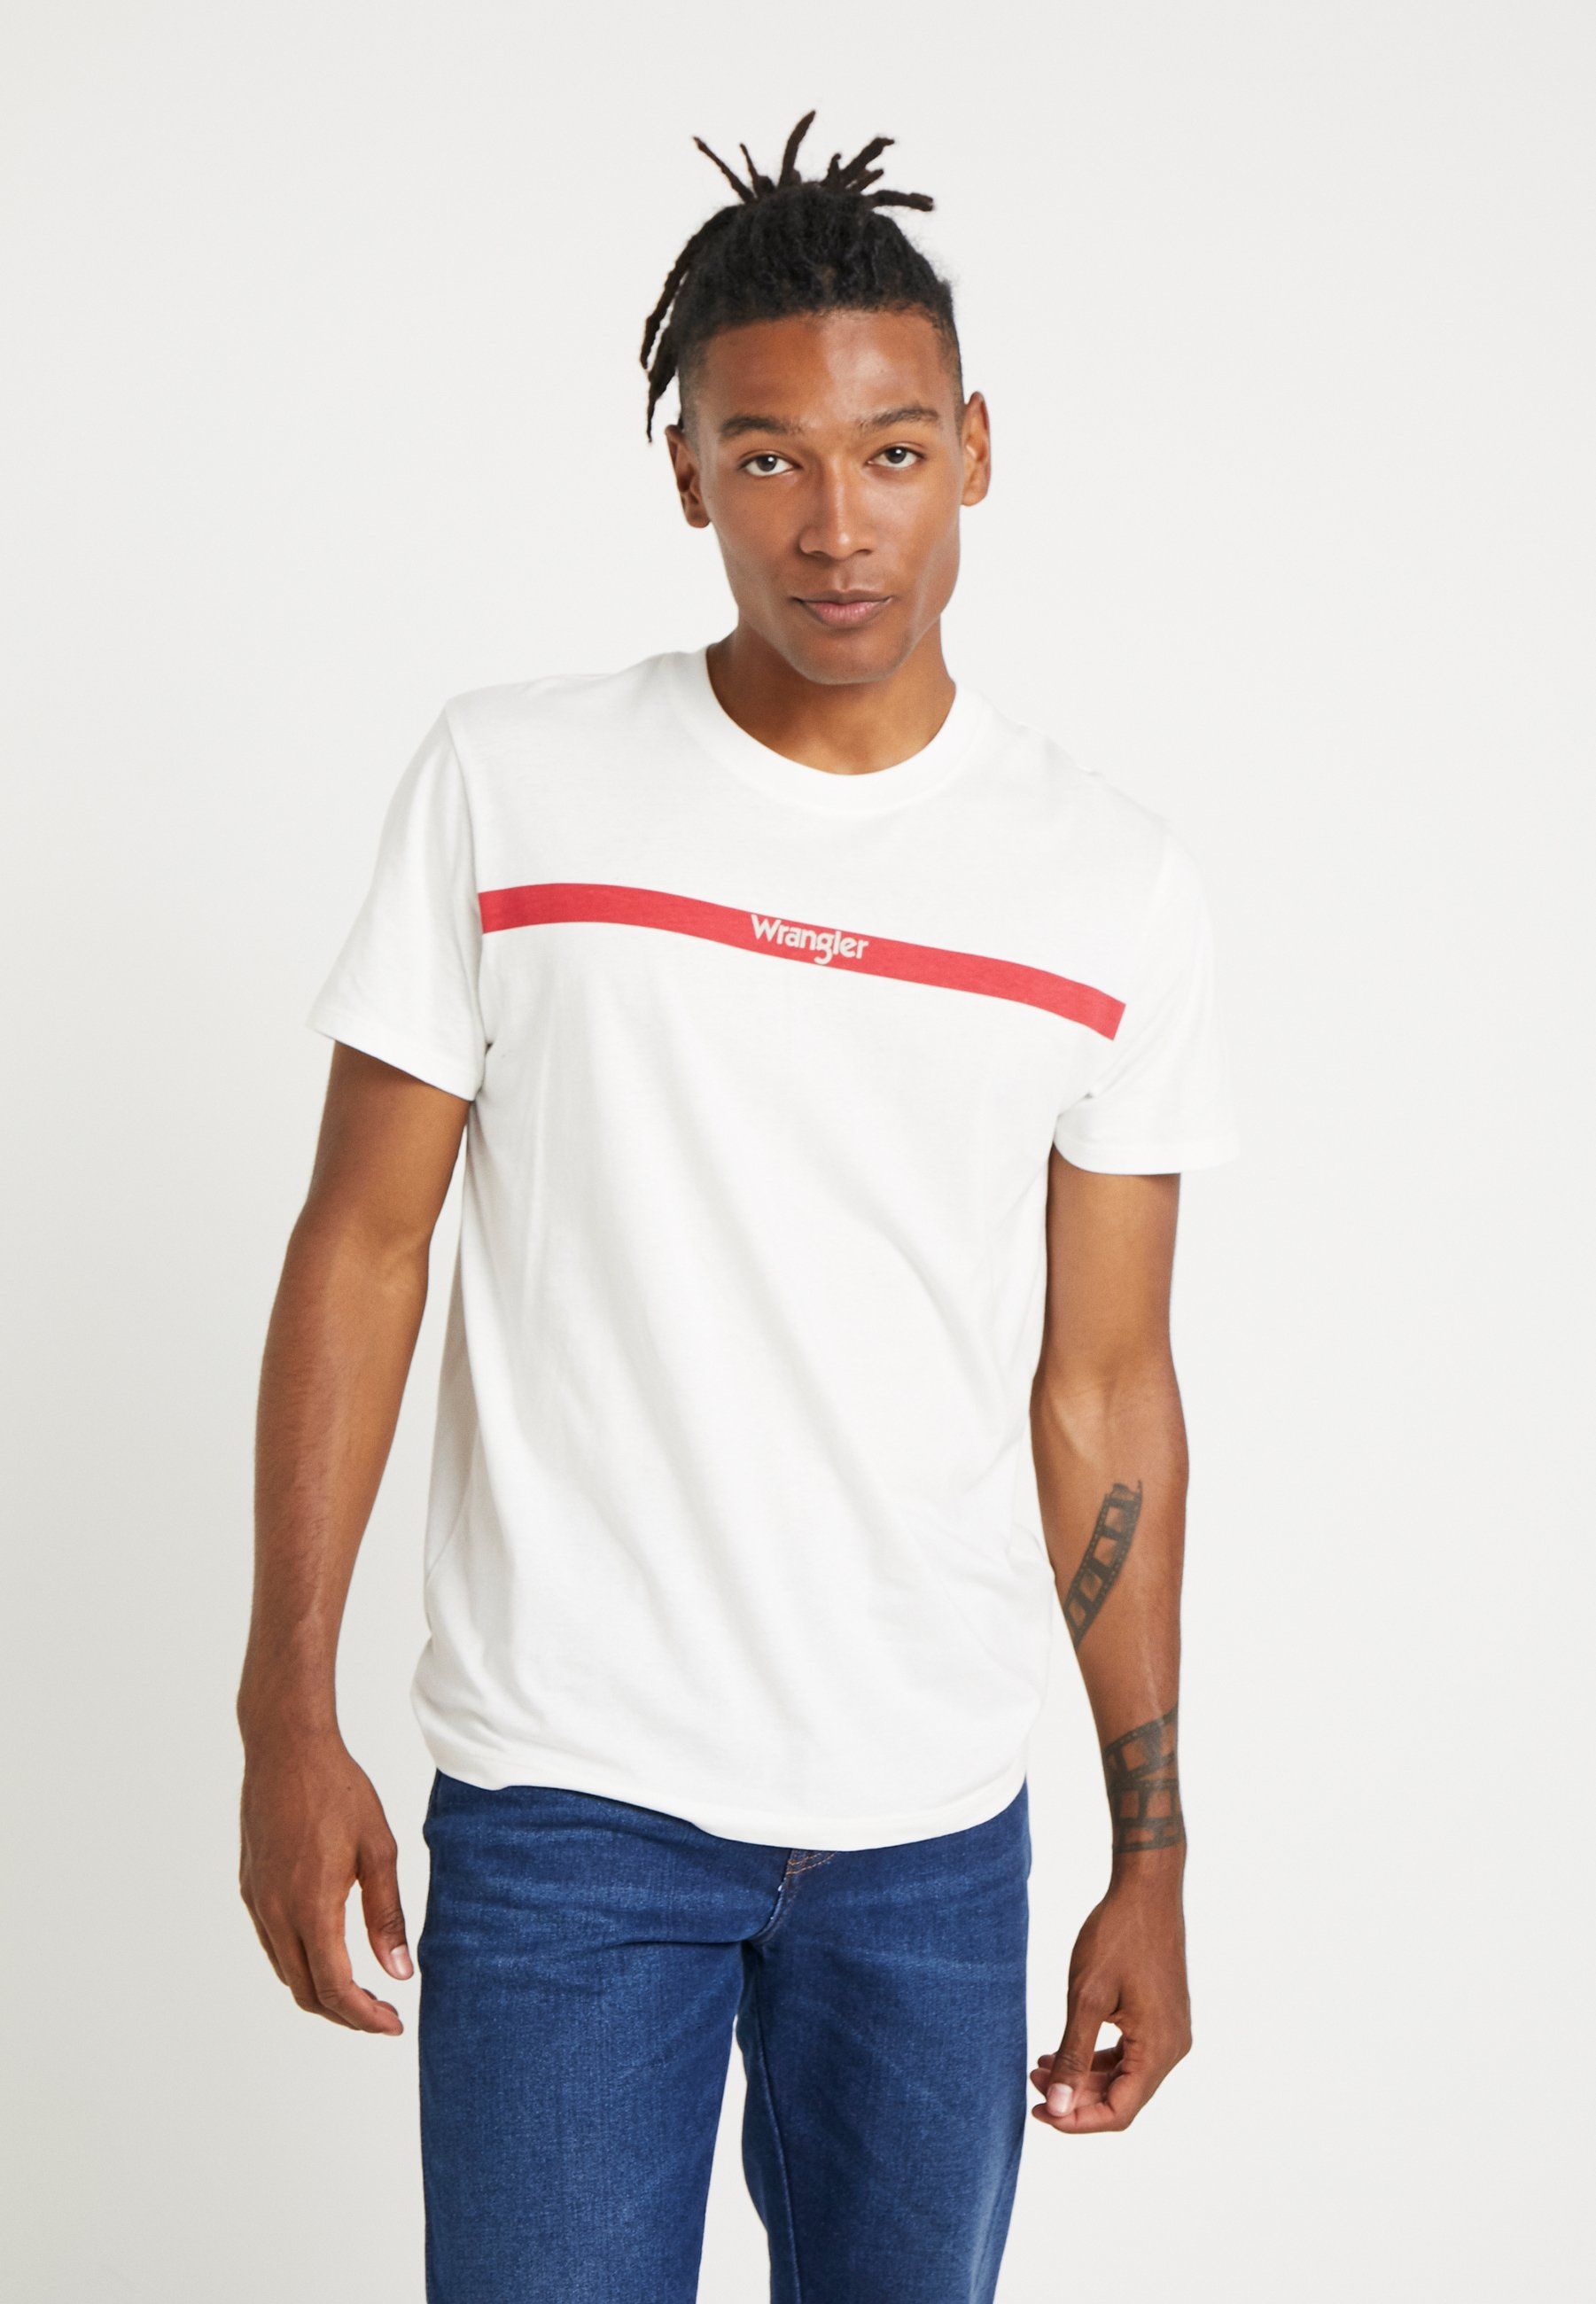 white LOGO TEET Wrangler Shirt print off STRIPE Rj54LA